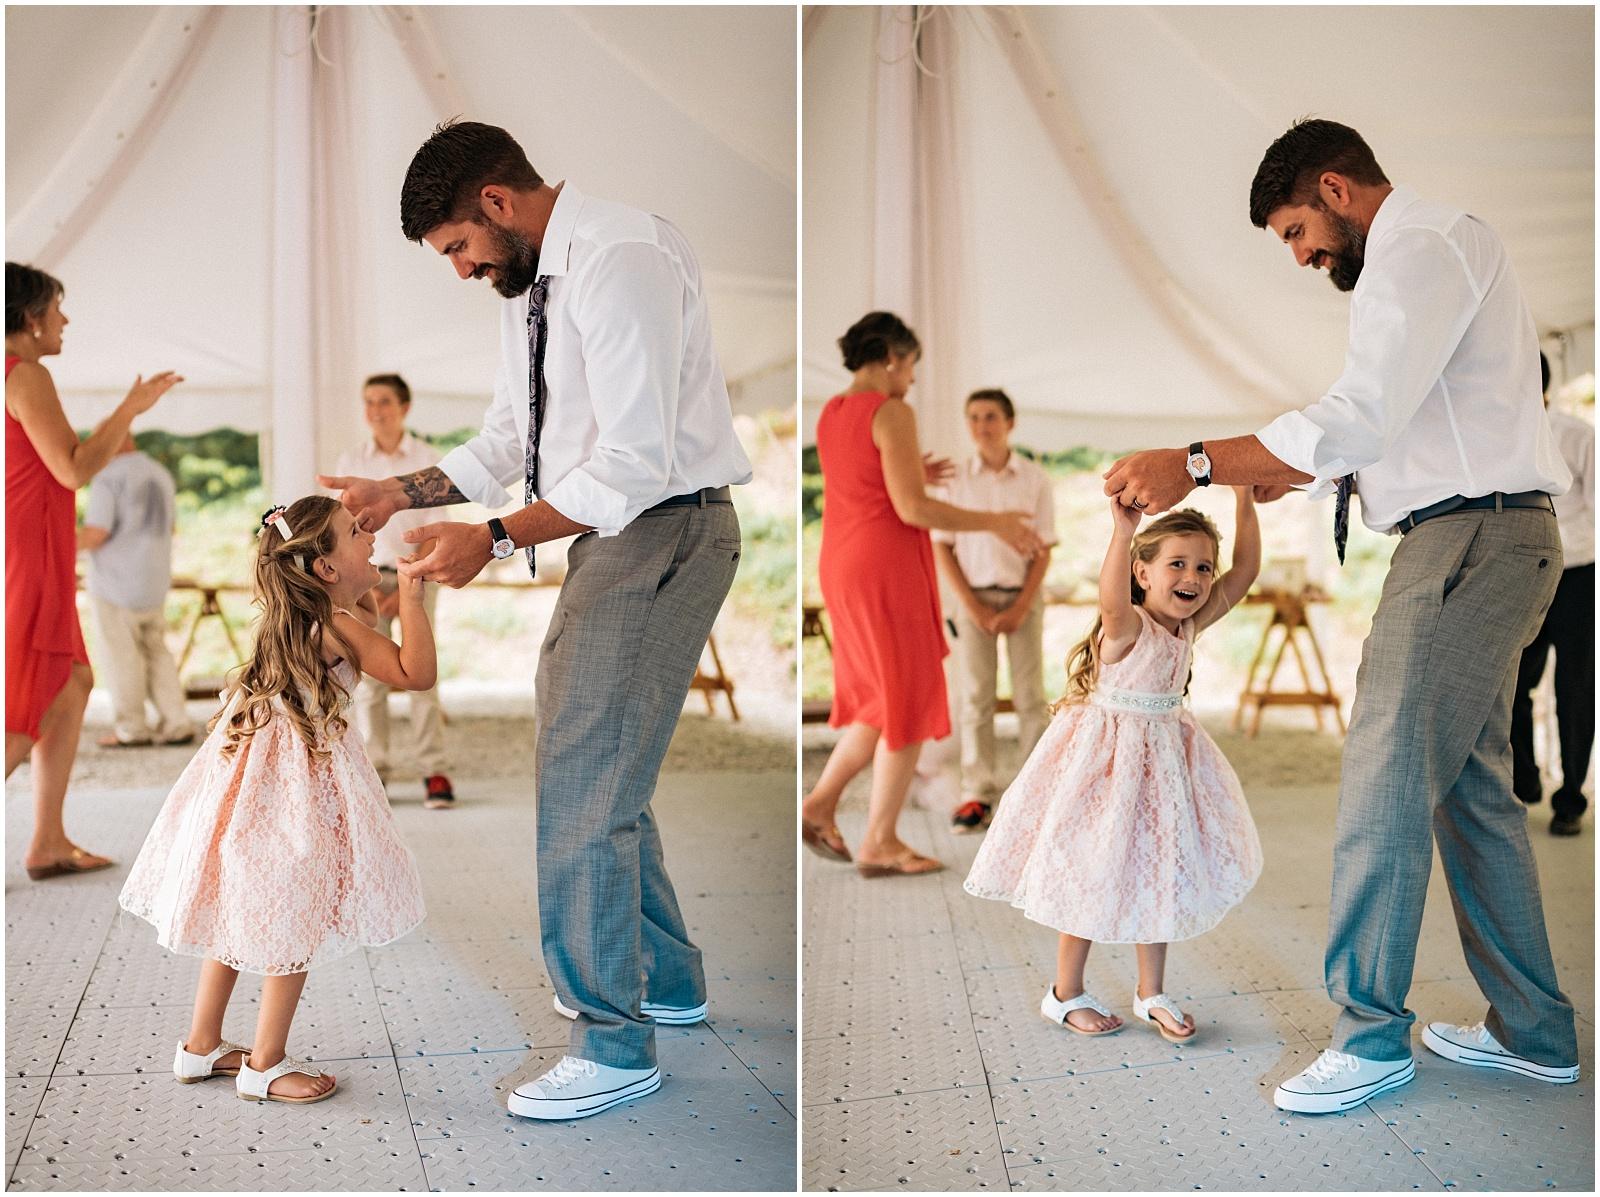 Dancing collage for Nantahala weddings